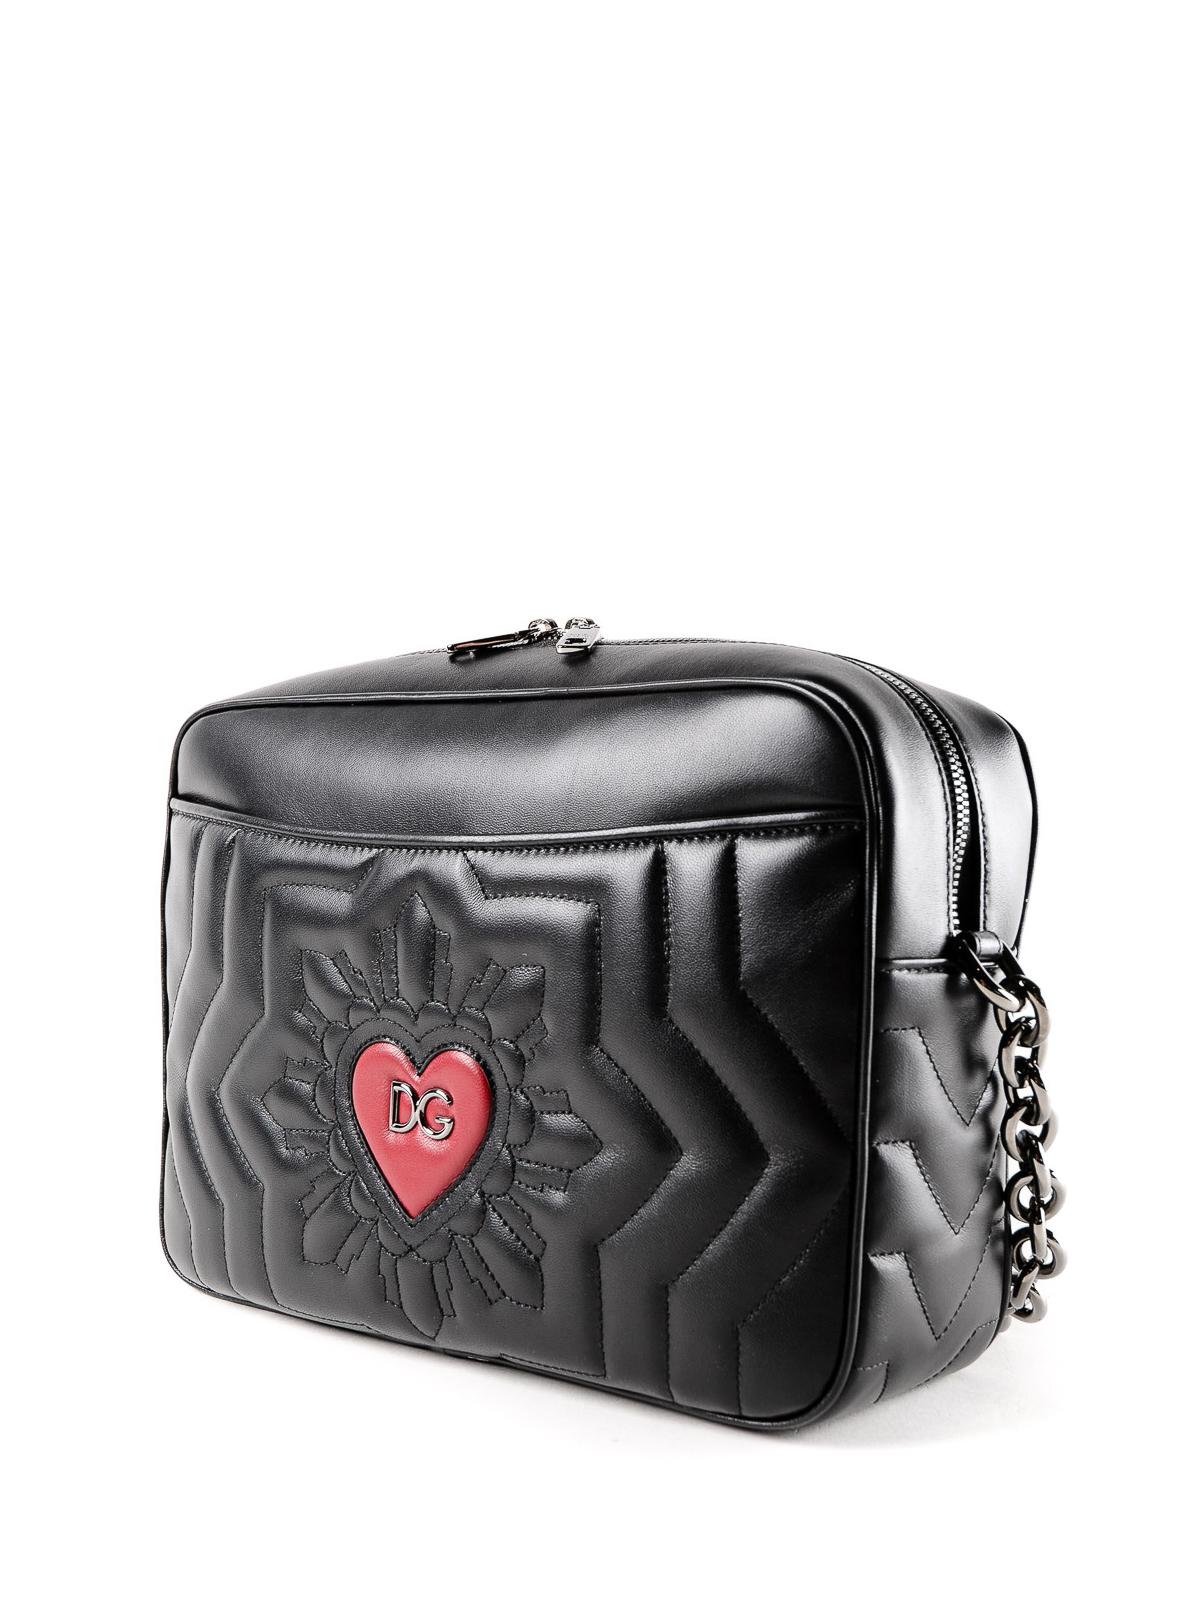 Dolce & Gabbana Logo heart matelasse leather tote I7OrBOow